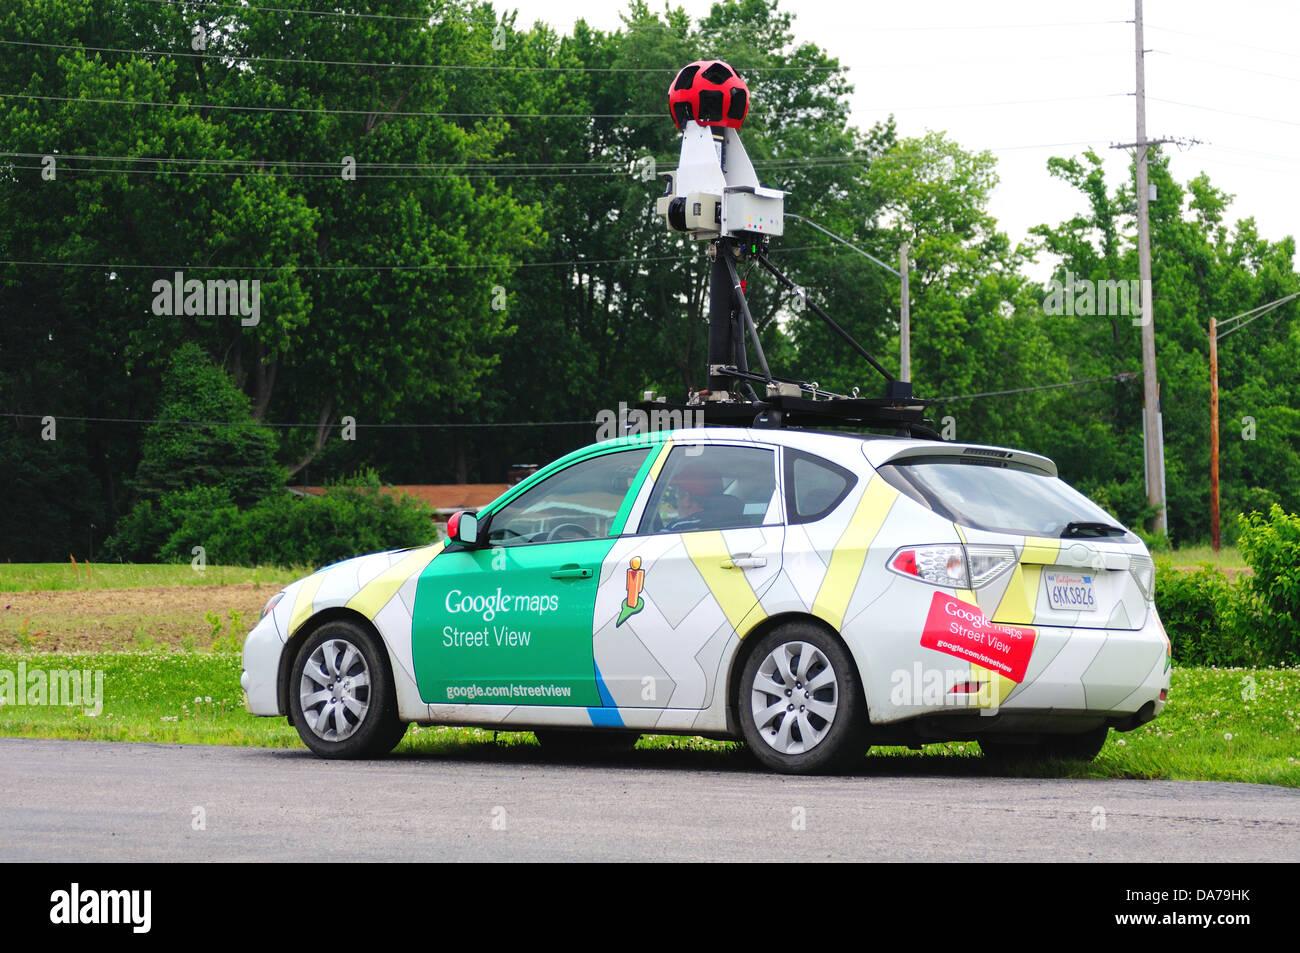 Google Maps Street View camera car Stock Photo: 57938879 - Alamy